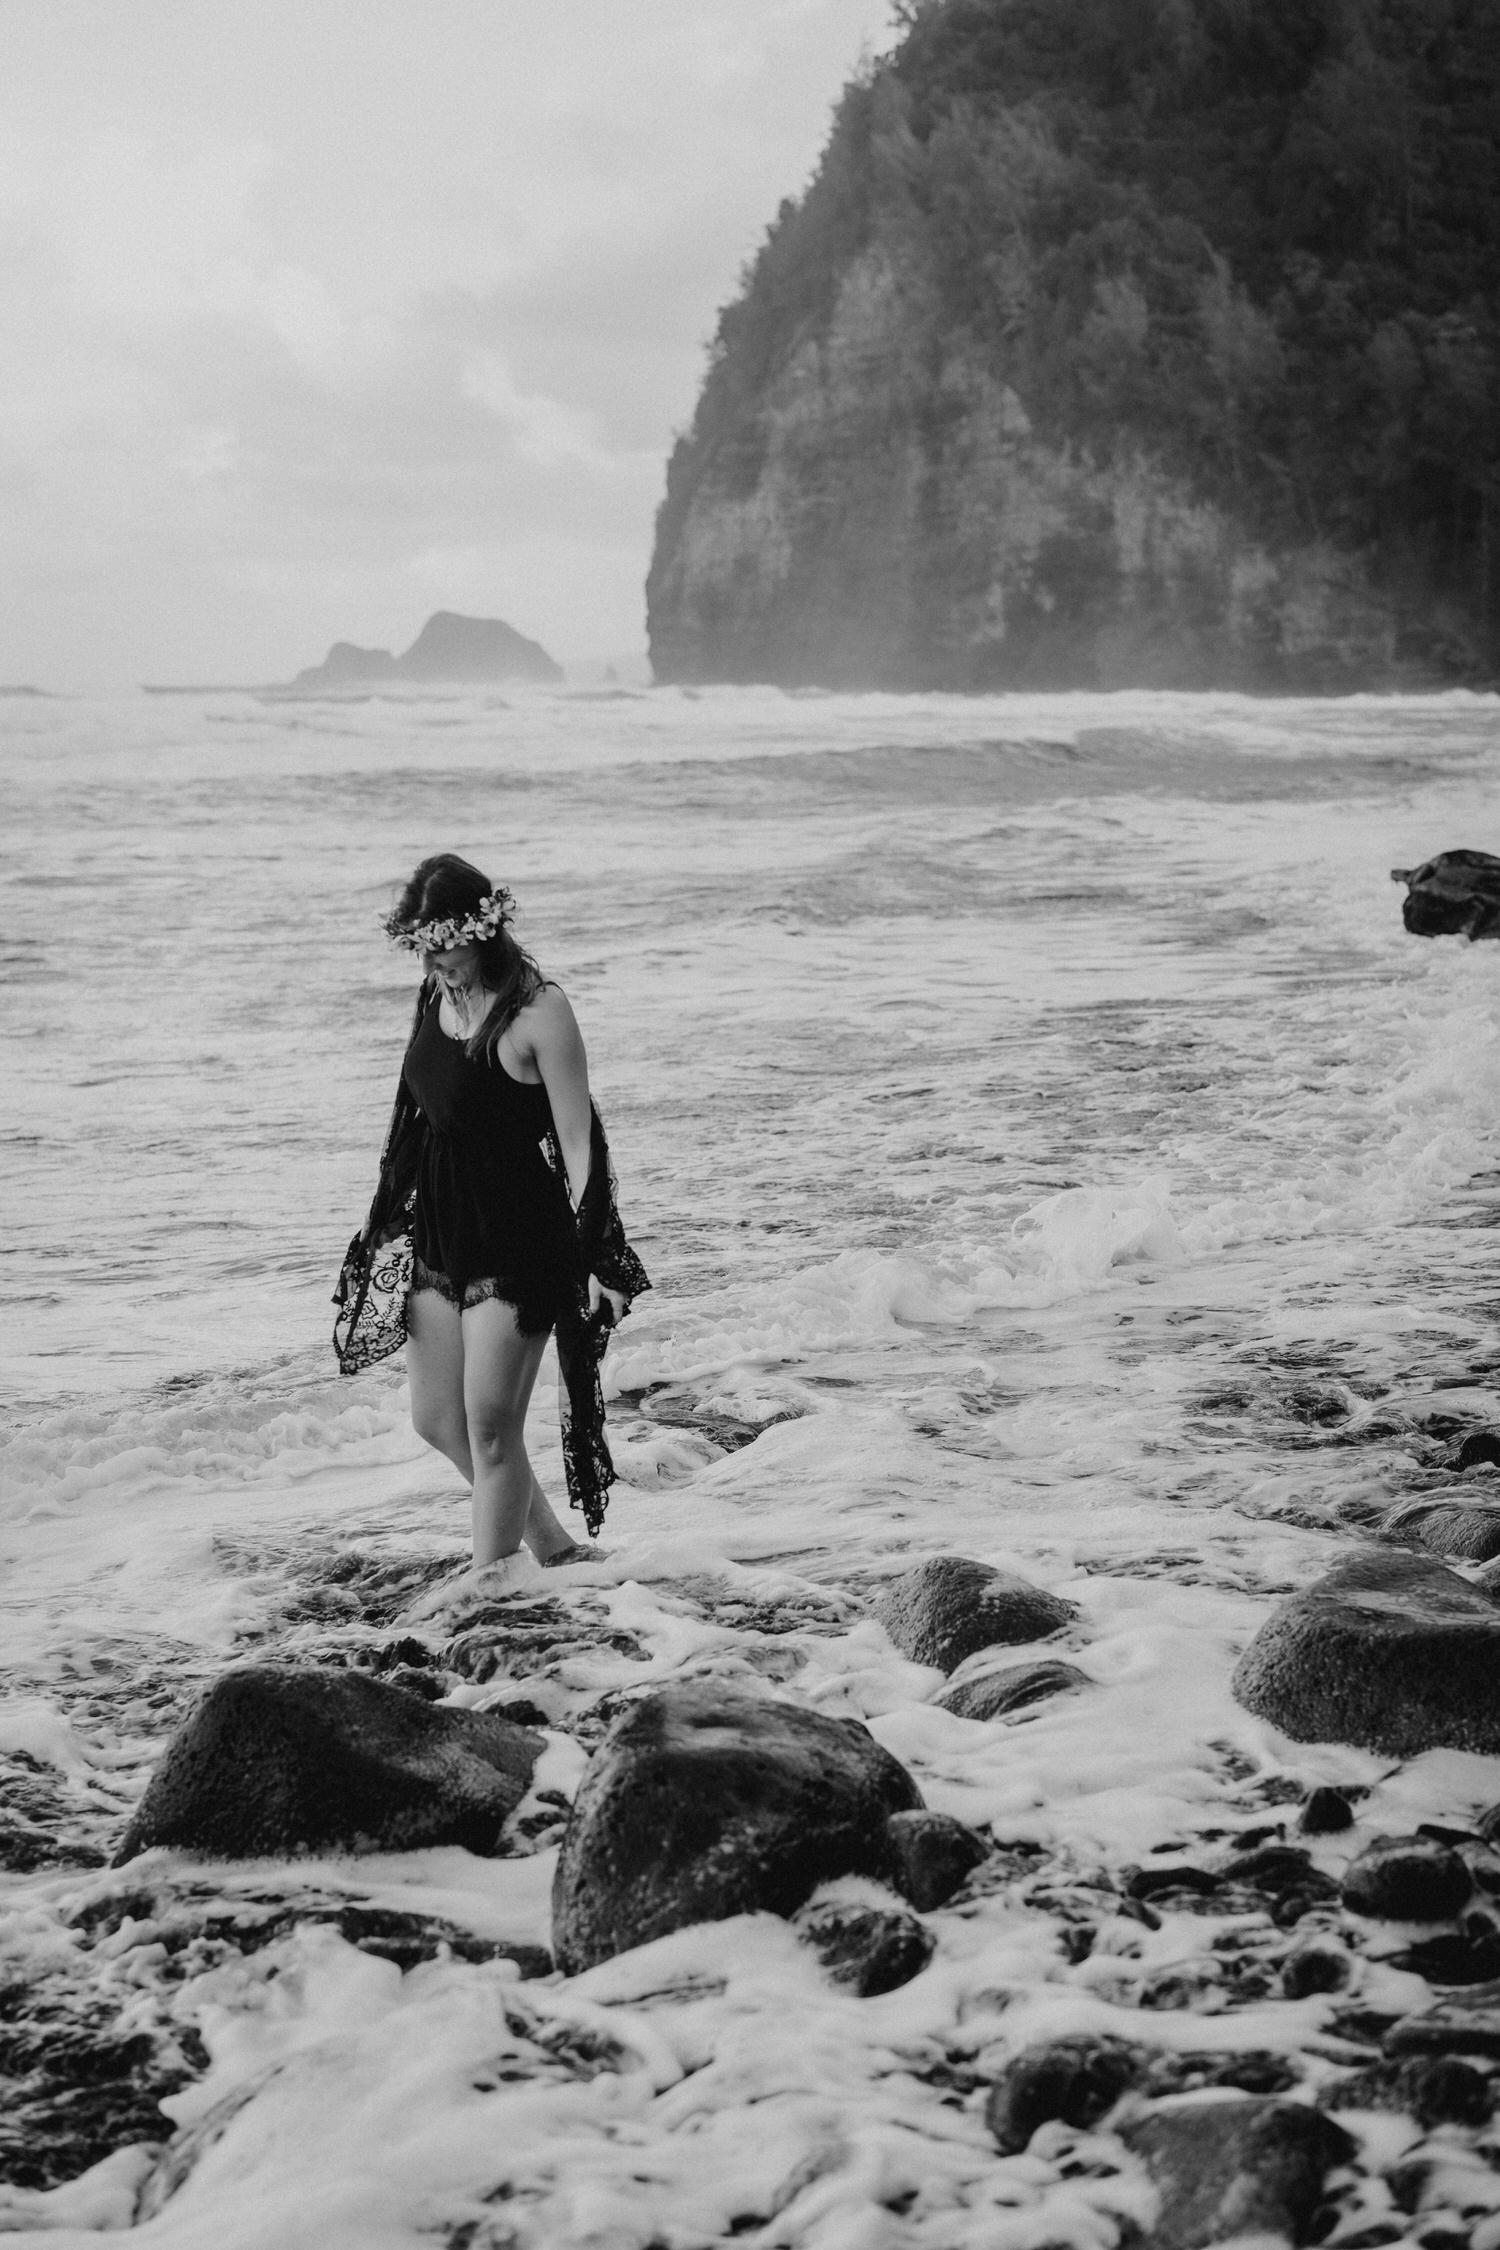 big island family photo session, hawaii photo session, big island photographer, big island photo session, best hawaii photographers, pololu valley photo session, hawaii anniversary, big island vow renewal, kona photographer, big island photos, hawaii unchained, big island best photos